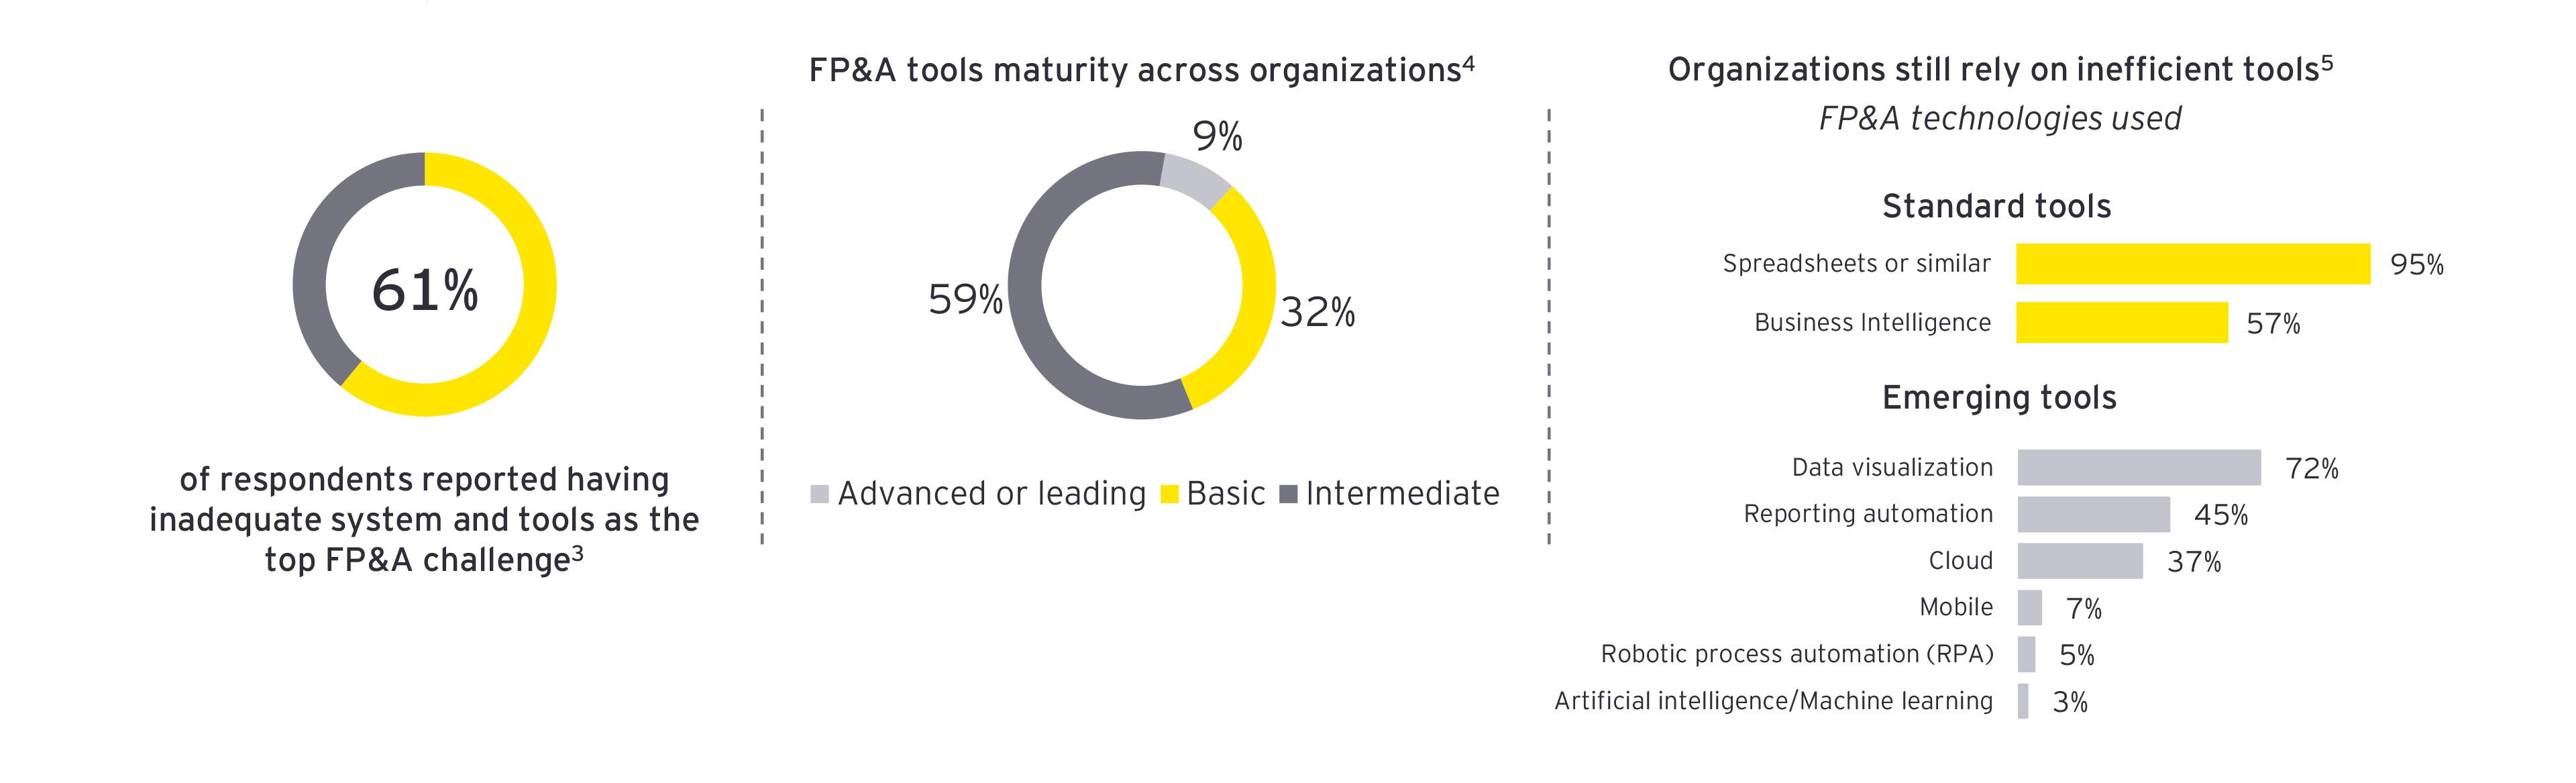 EY - FPA -tools-maturity-across-organizations